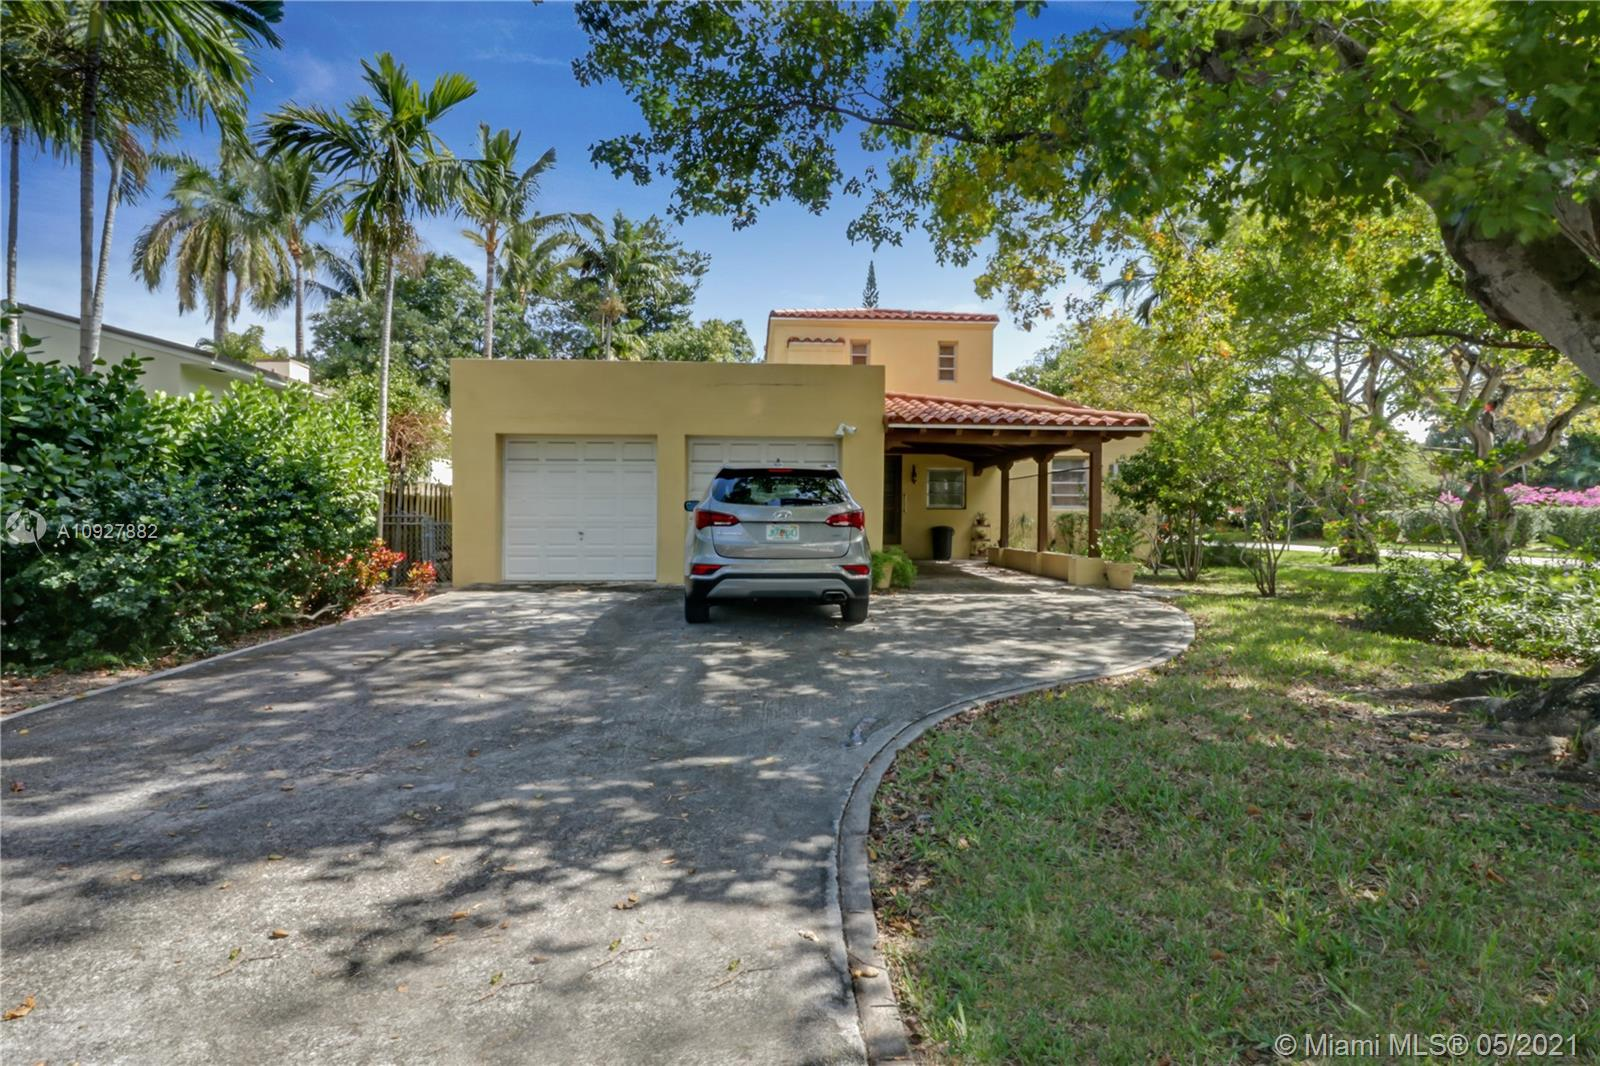 Orchard - 441 W 34th St, Miami Beach, FL 33140